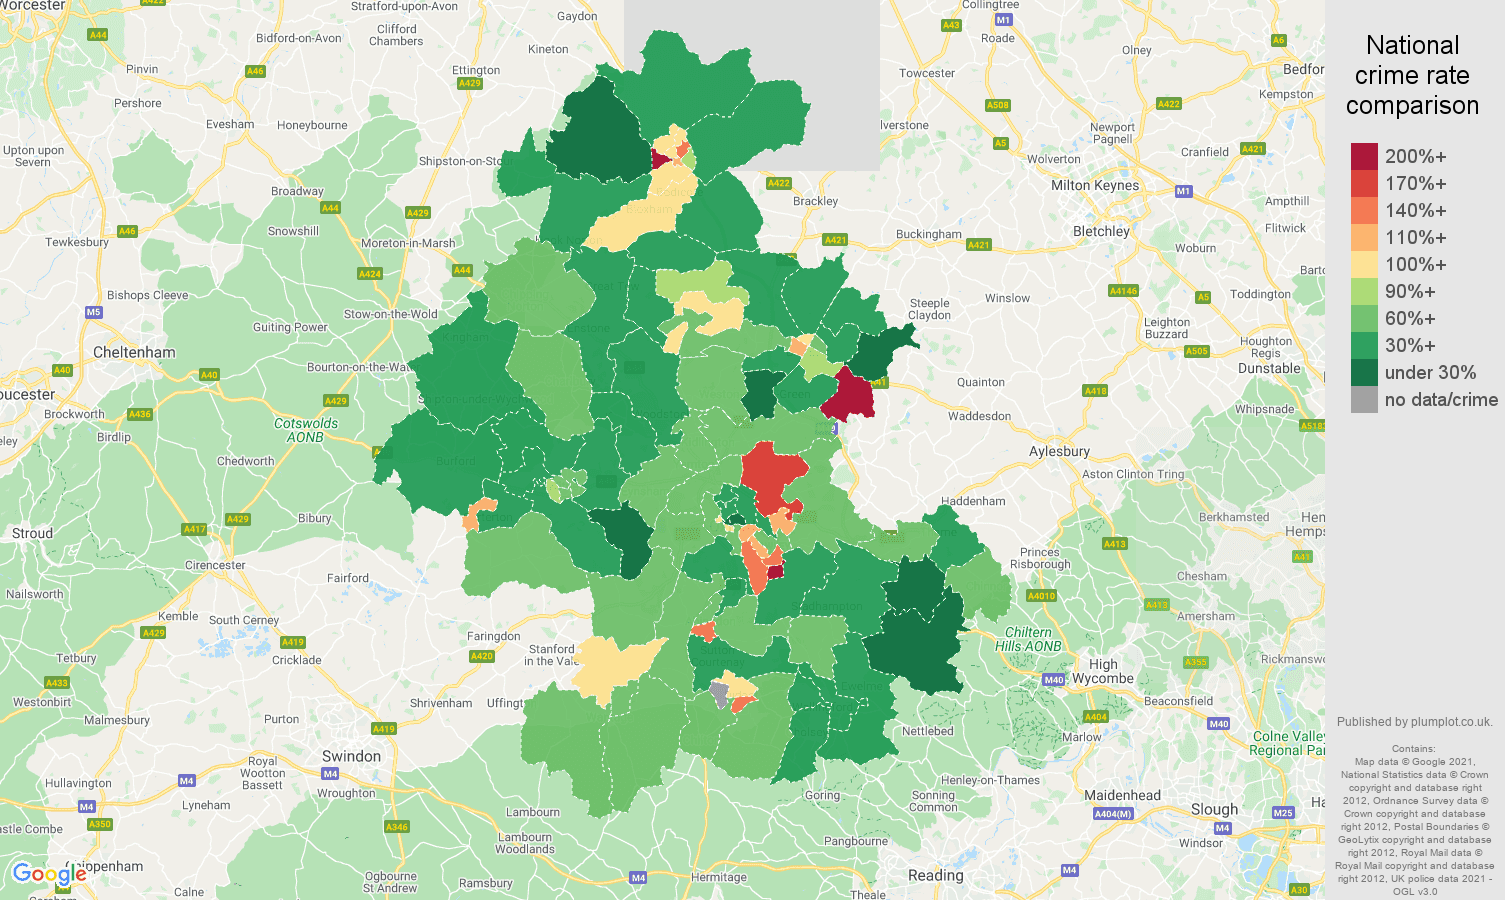 Oxford violent crime rate comparison map